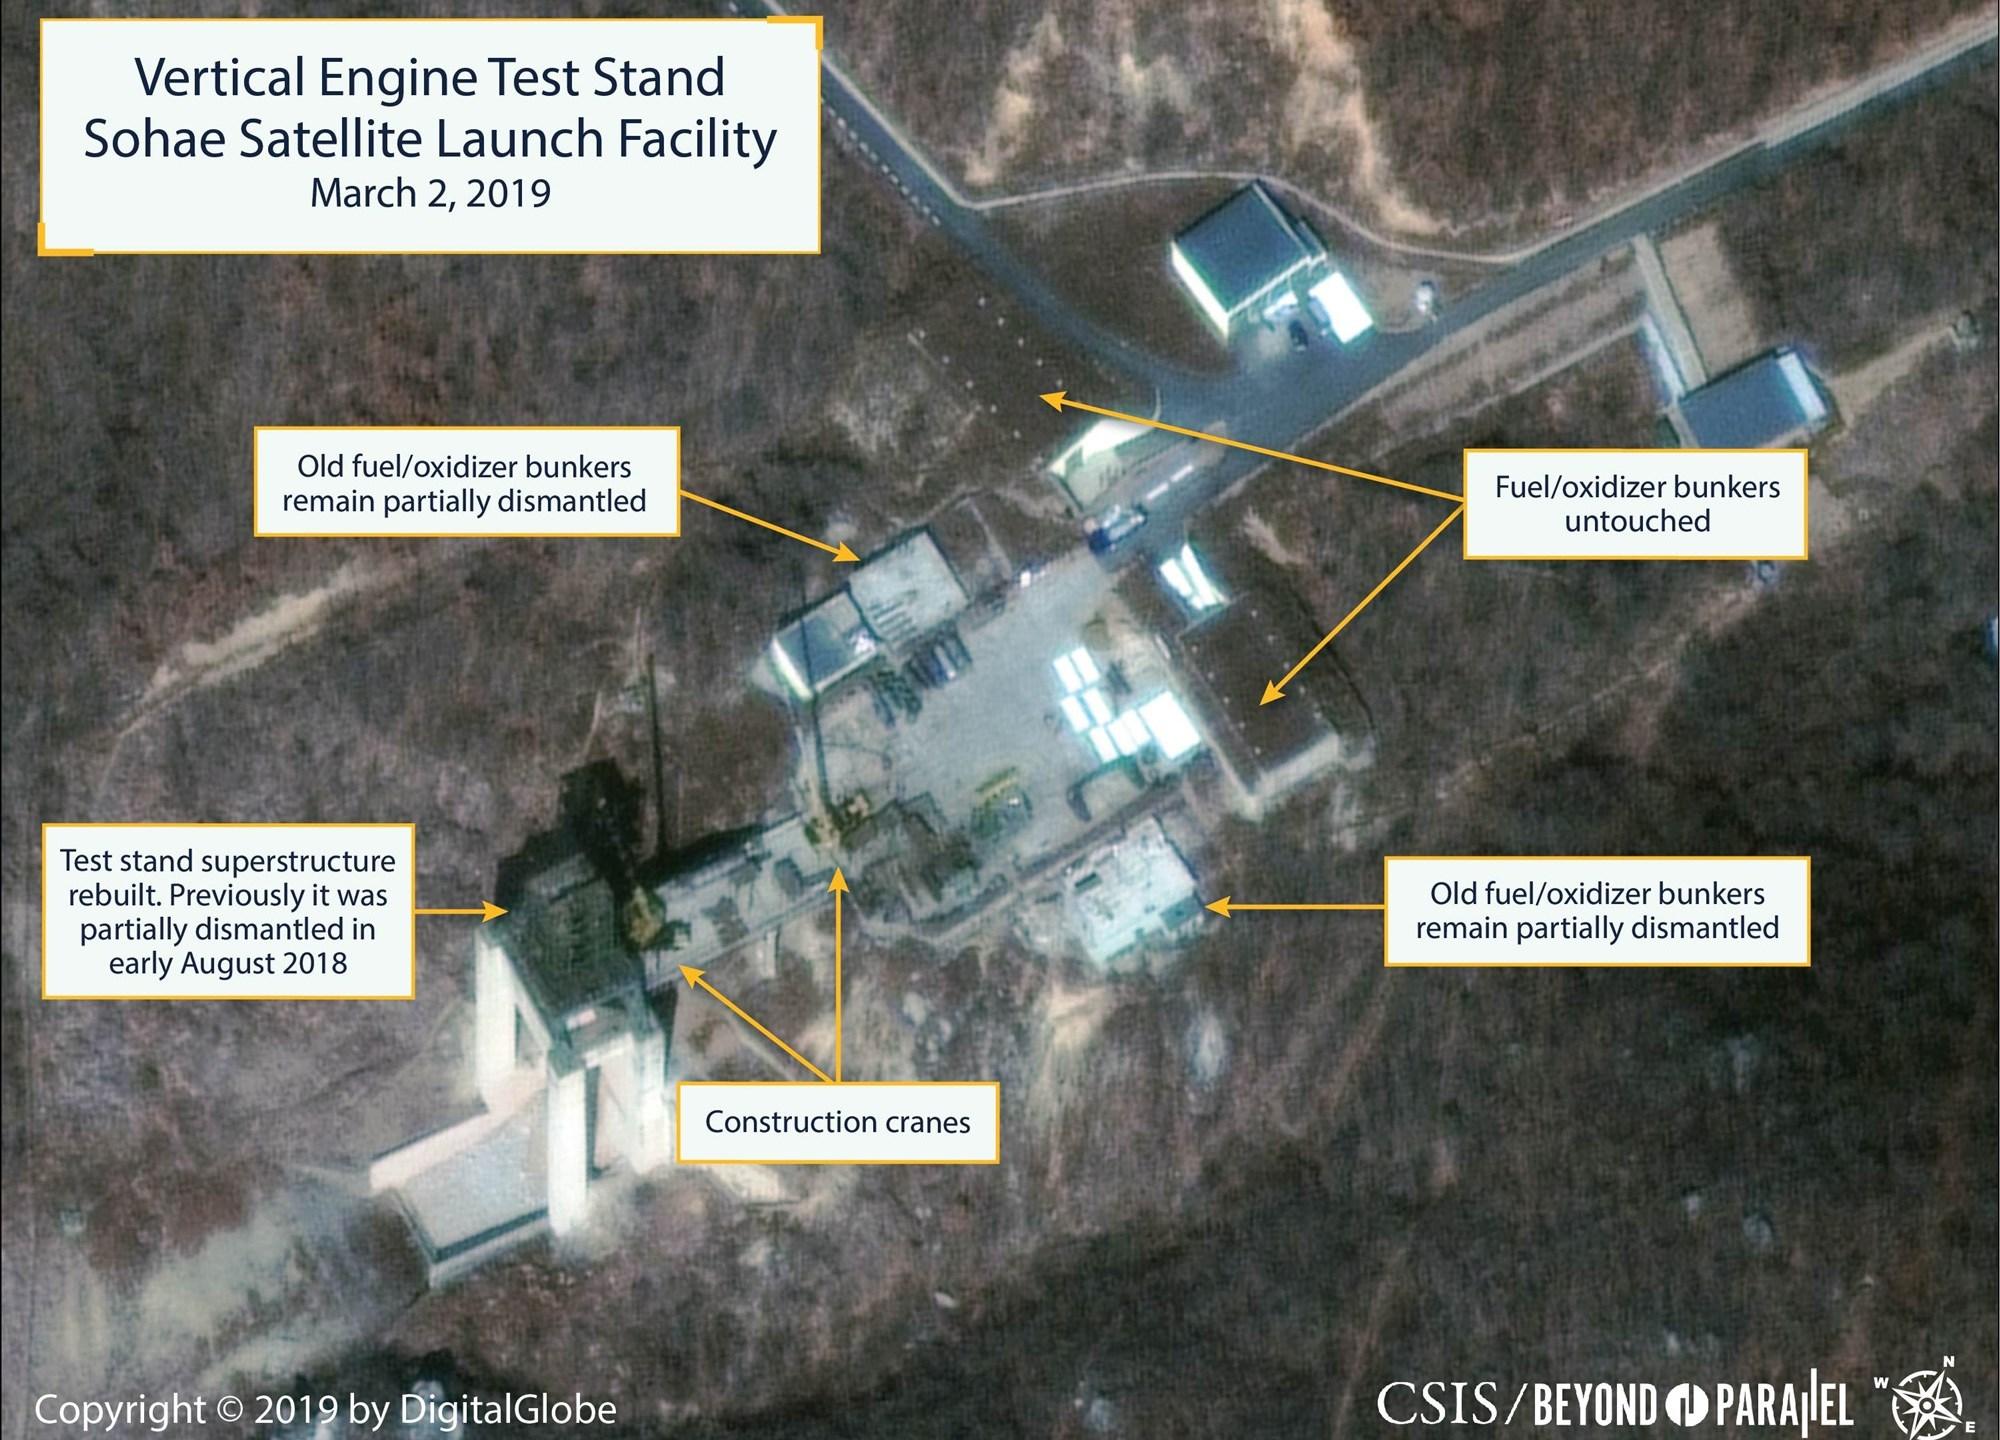 Korea launch facility_1551850733004.jpg.jpg